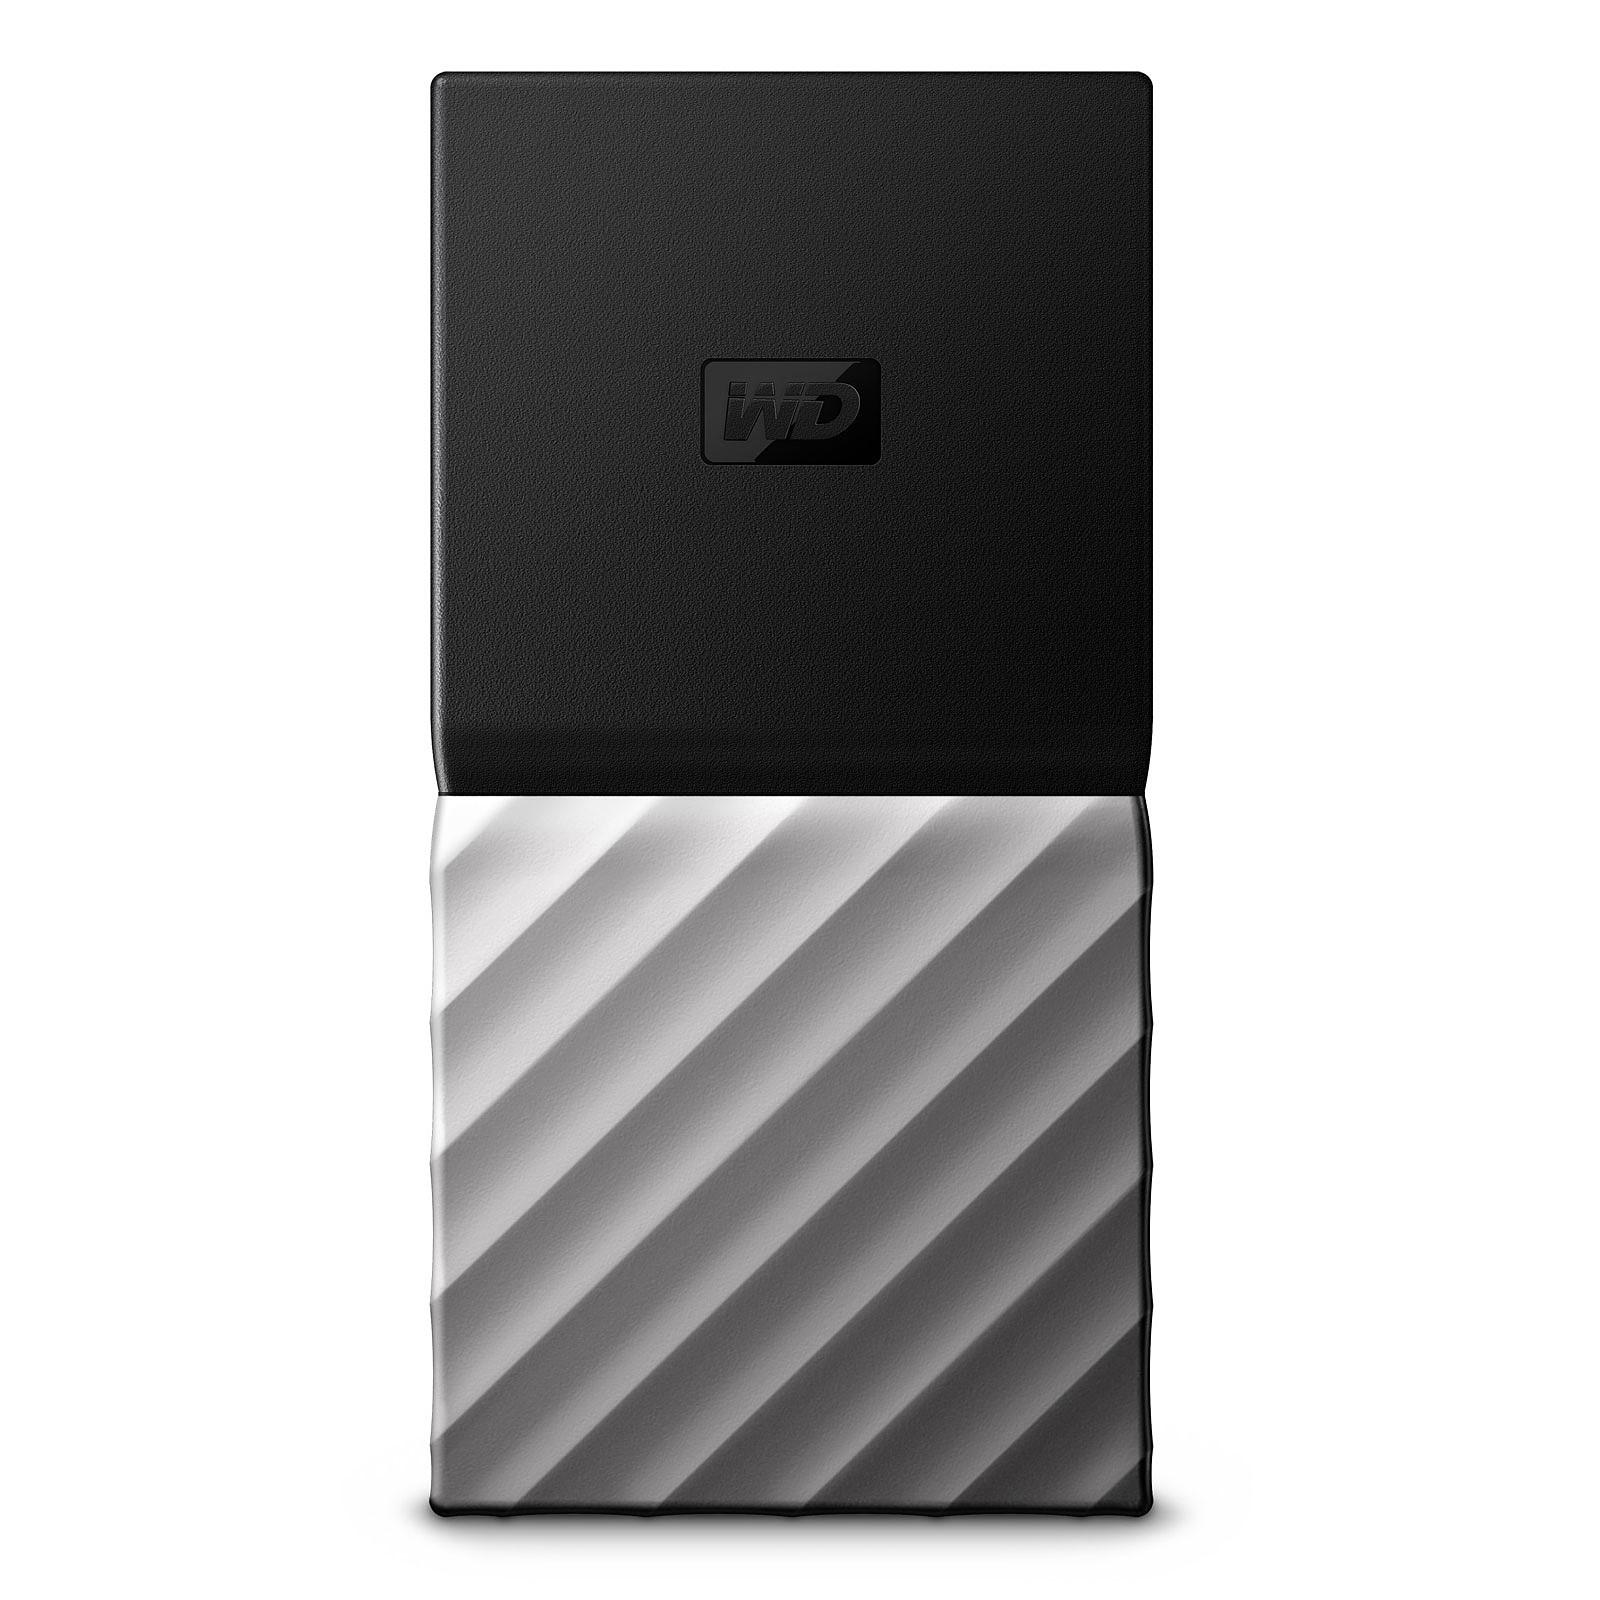 WD My Passport SSD 256 Go USB 3.1 (WDBKVX2560PSL)